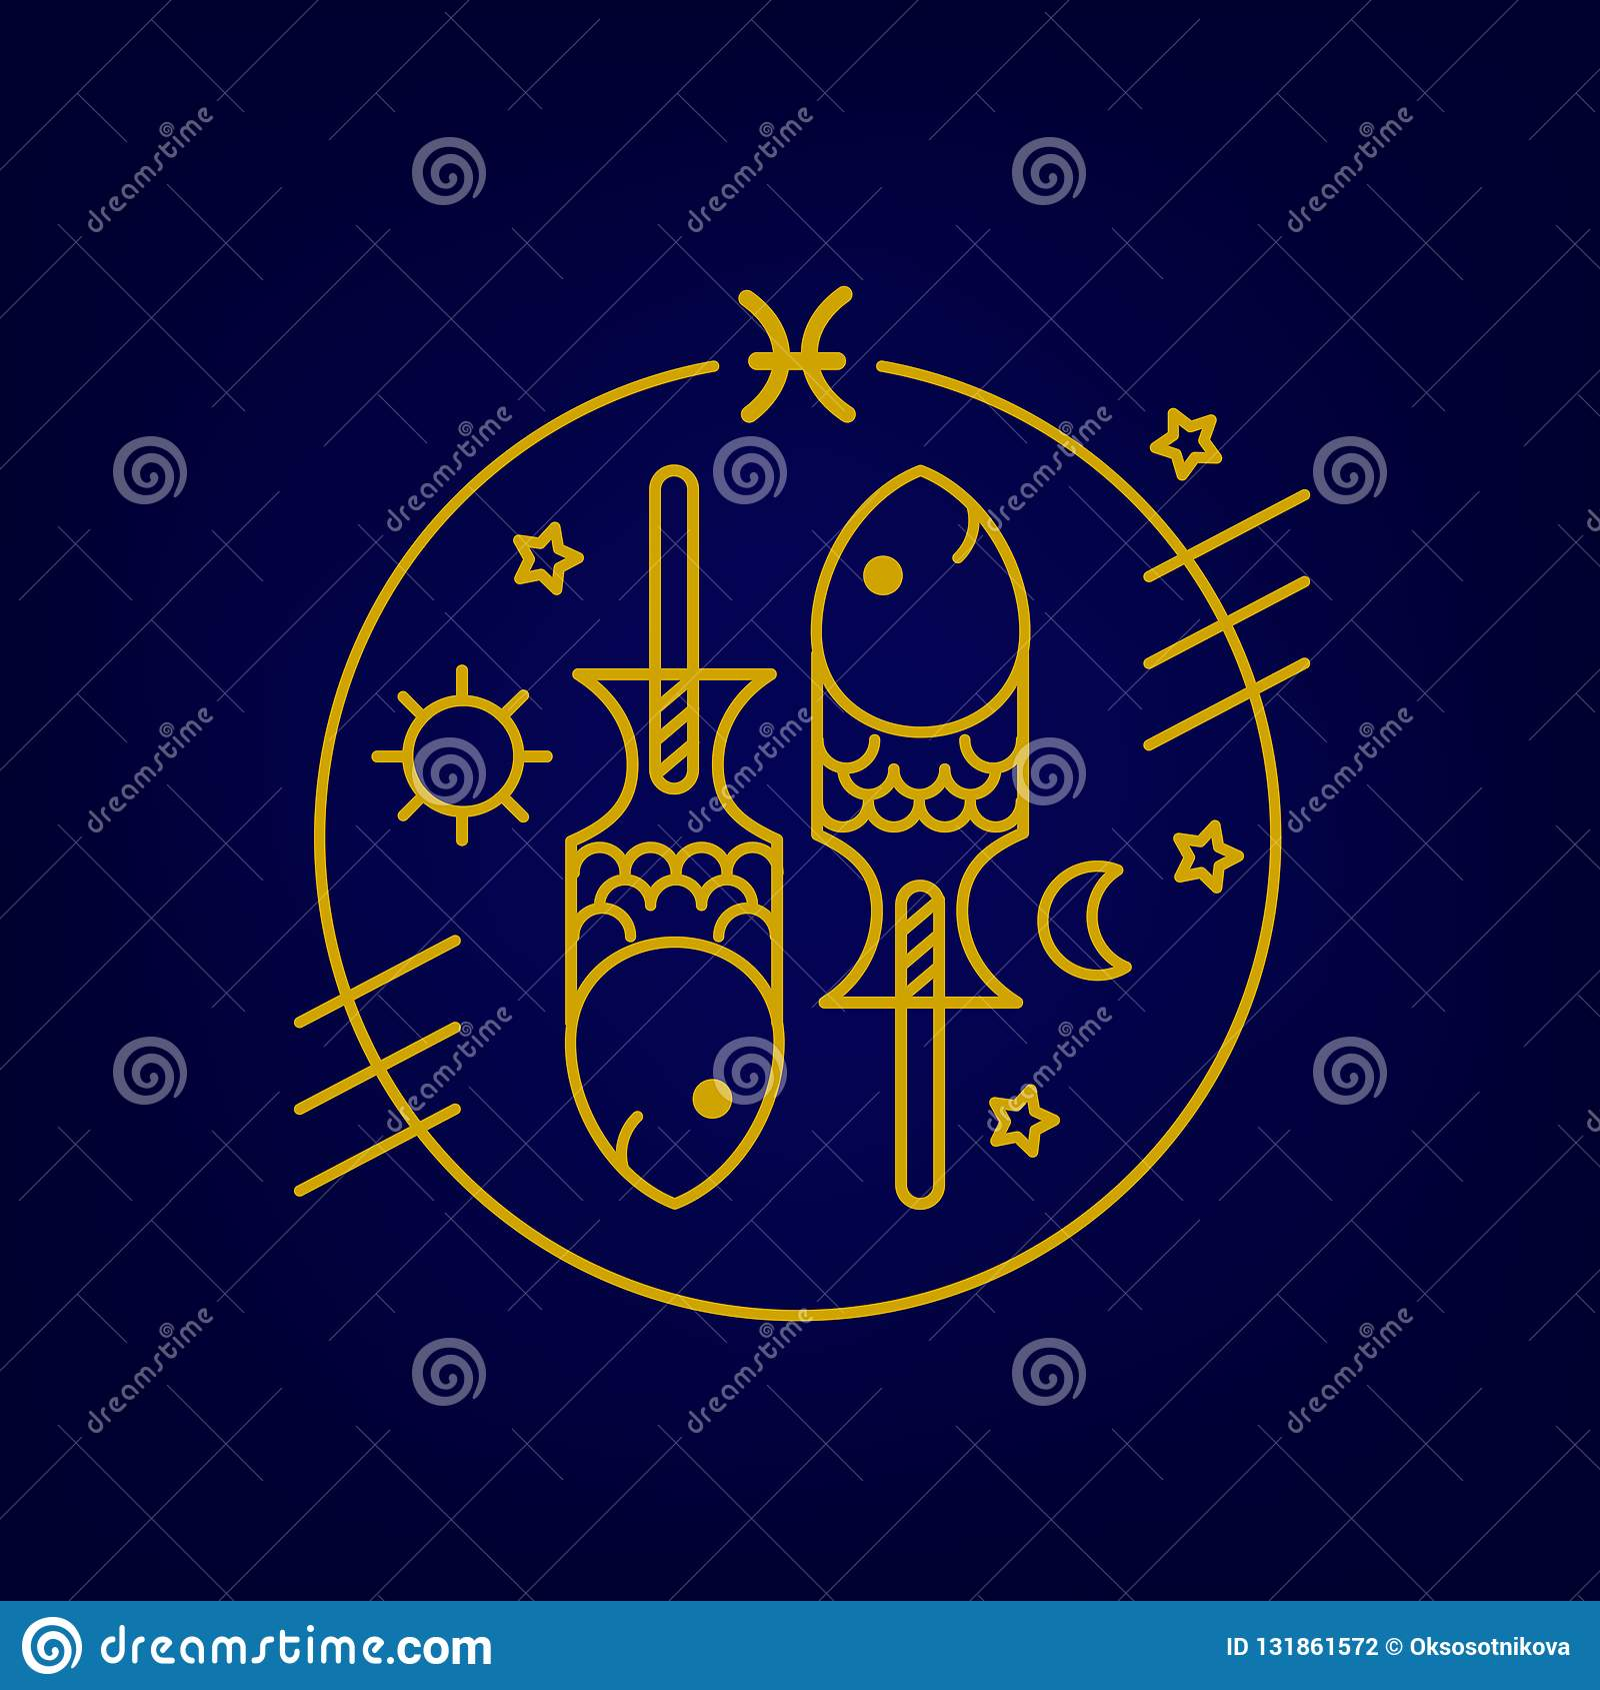 Vector Fish Or Pisces Zodiac Sign, Logo Or Illustration